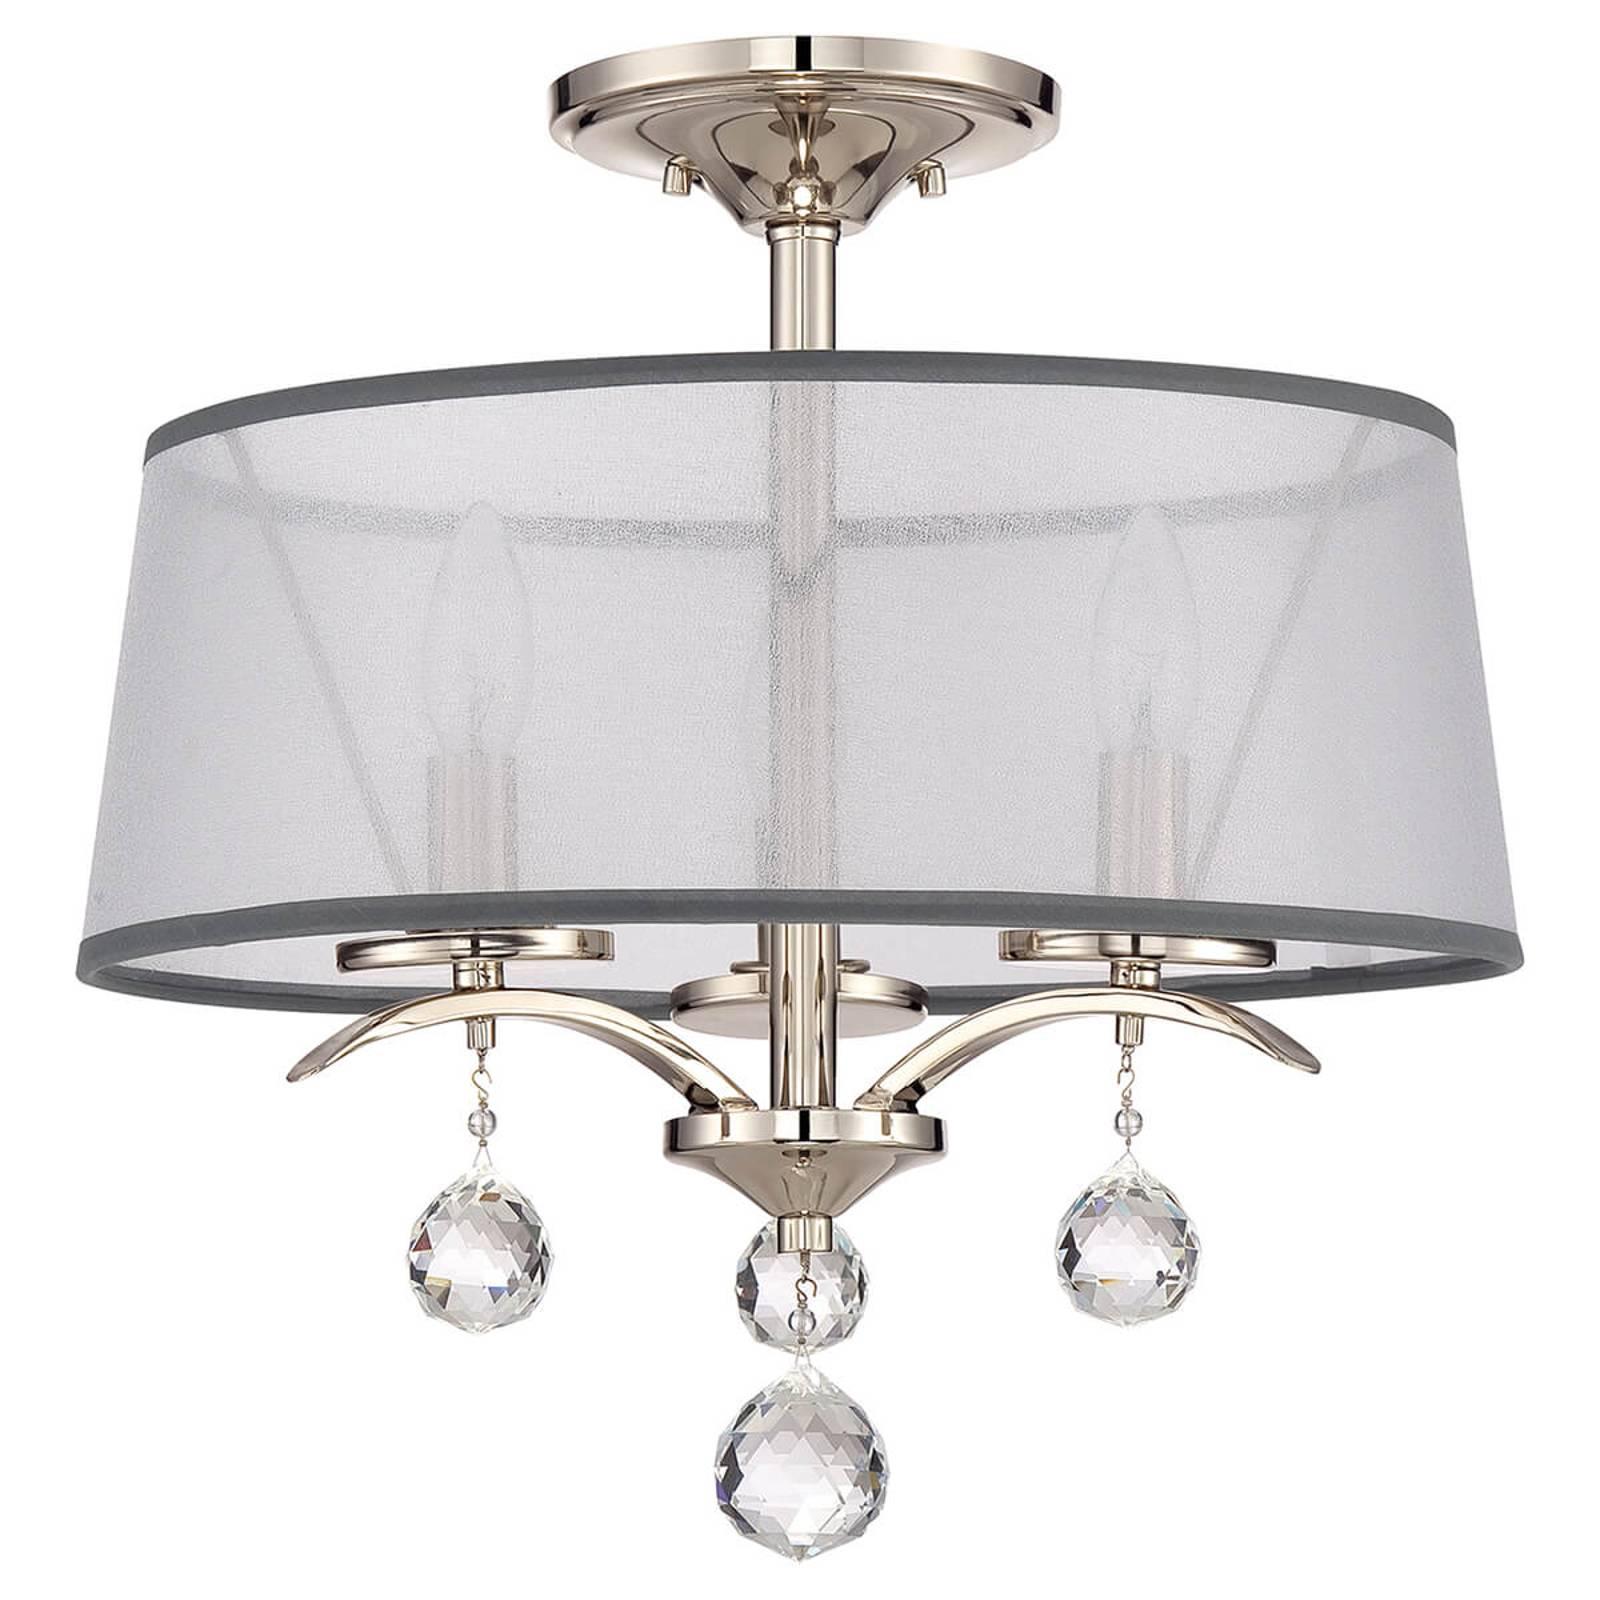 Kristal hangende plafondlamp Whitney